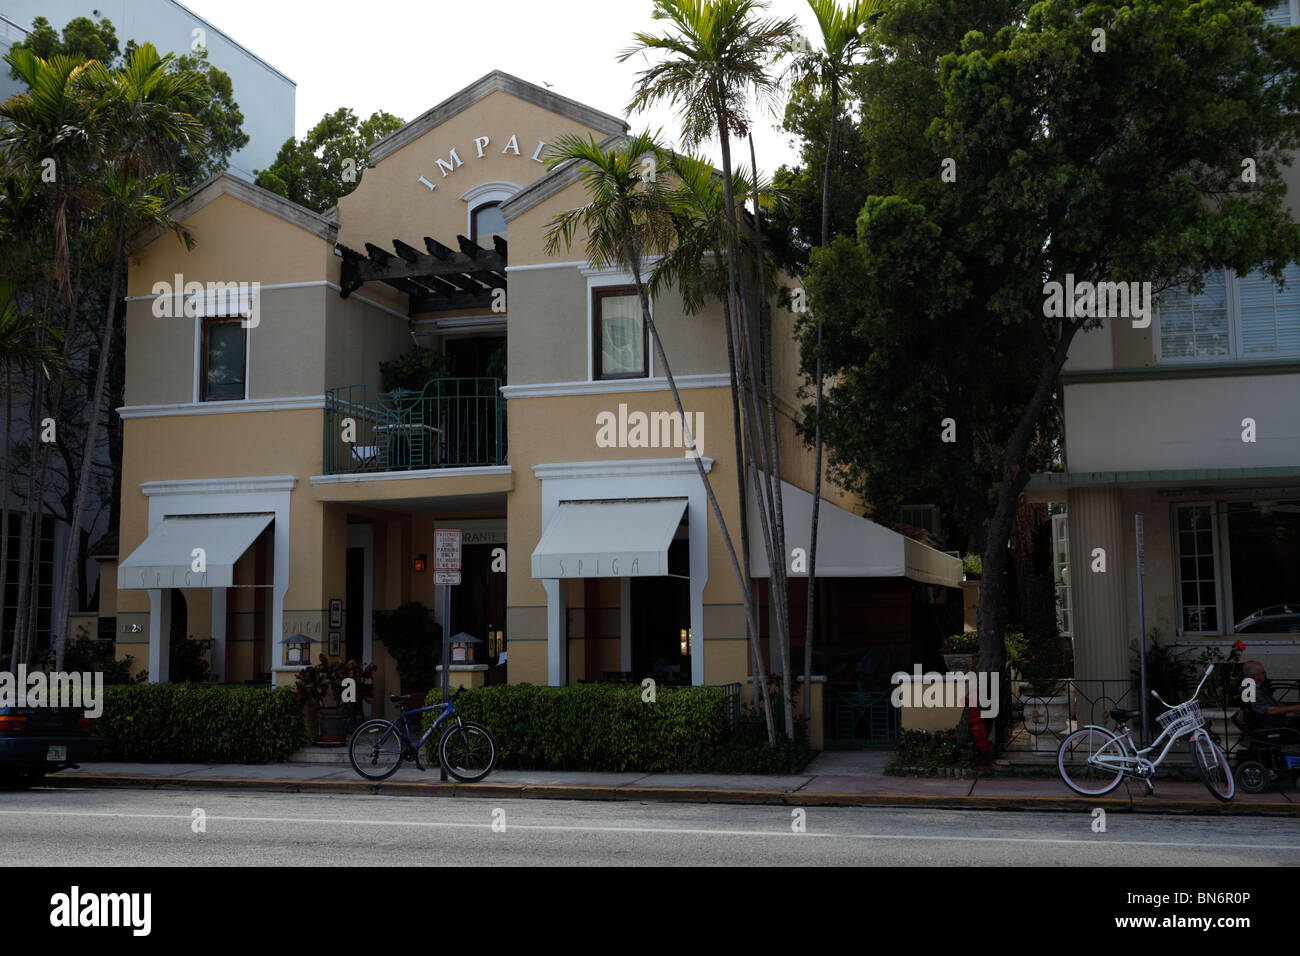 Miami south beach art deco district - Stock Image